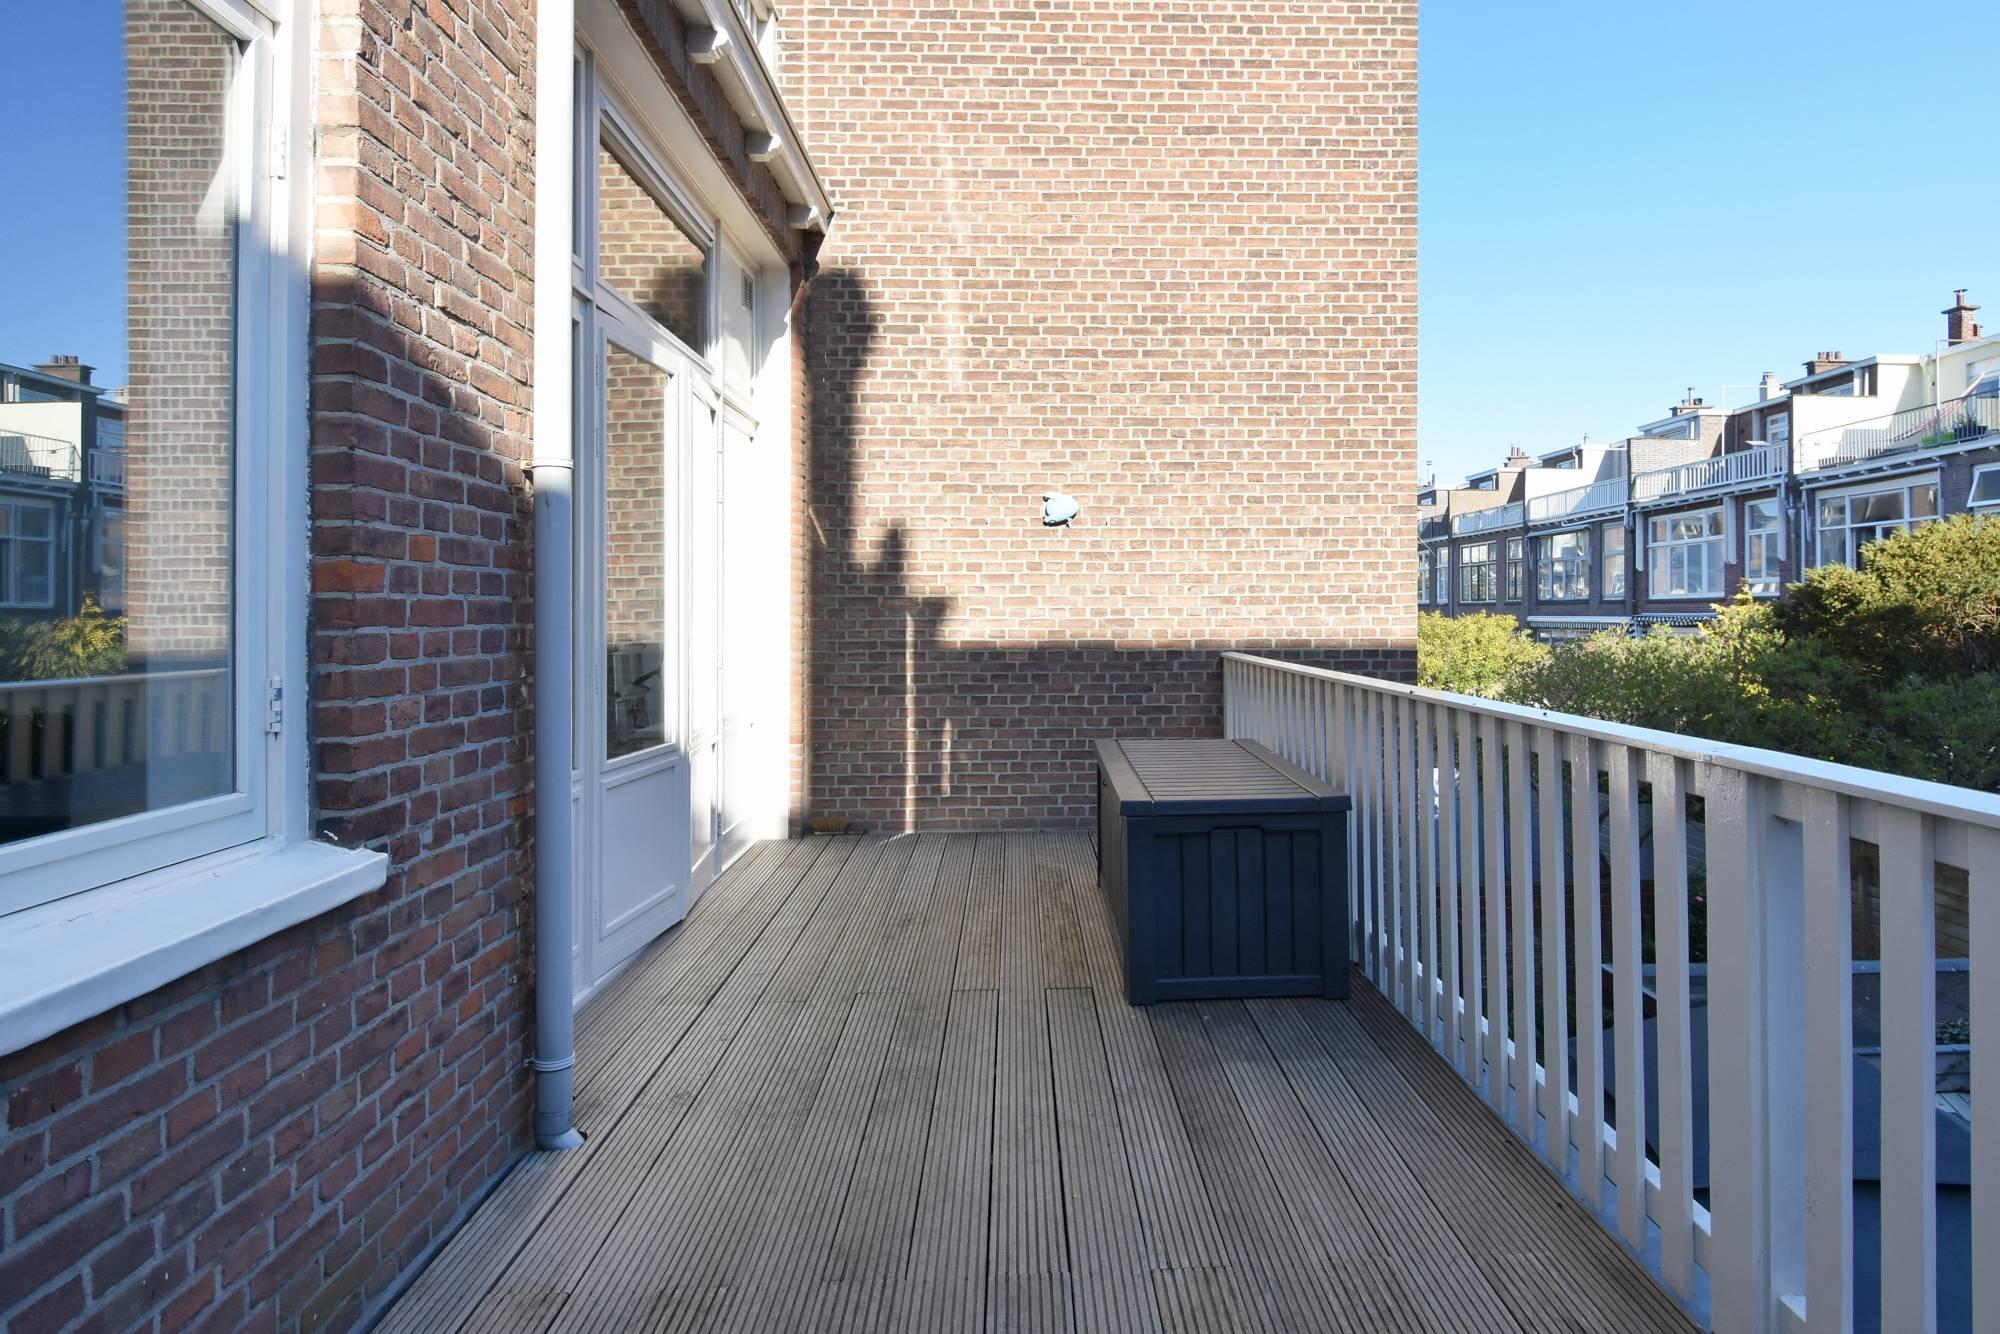 https://public.parariusoffice.nl/185/photos/huge/52003107.1554282525-687.JPG